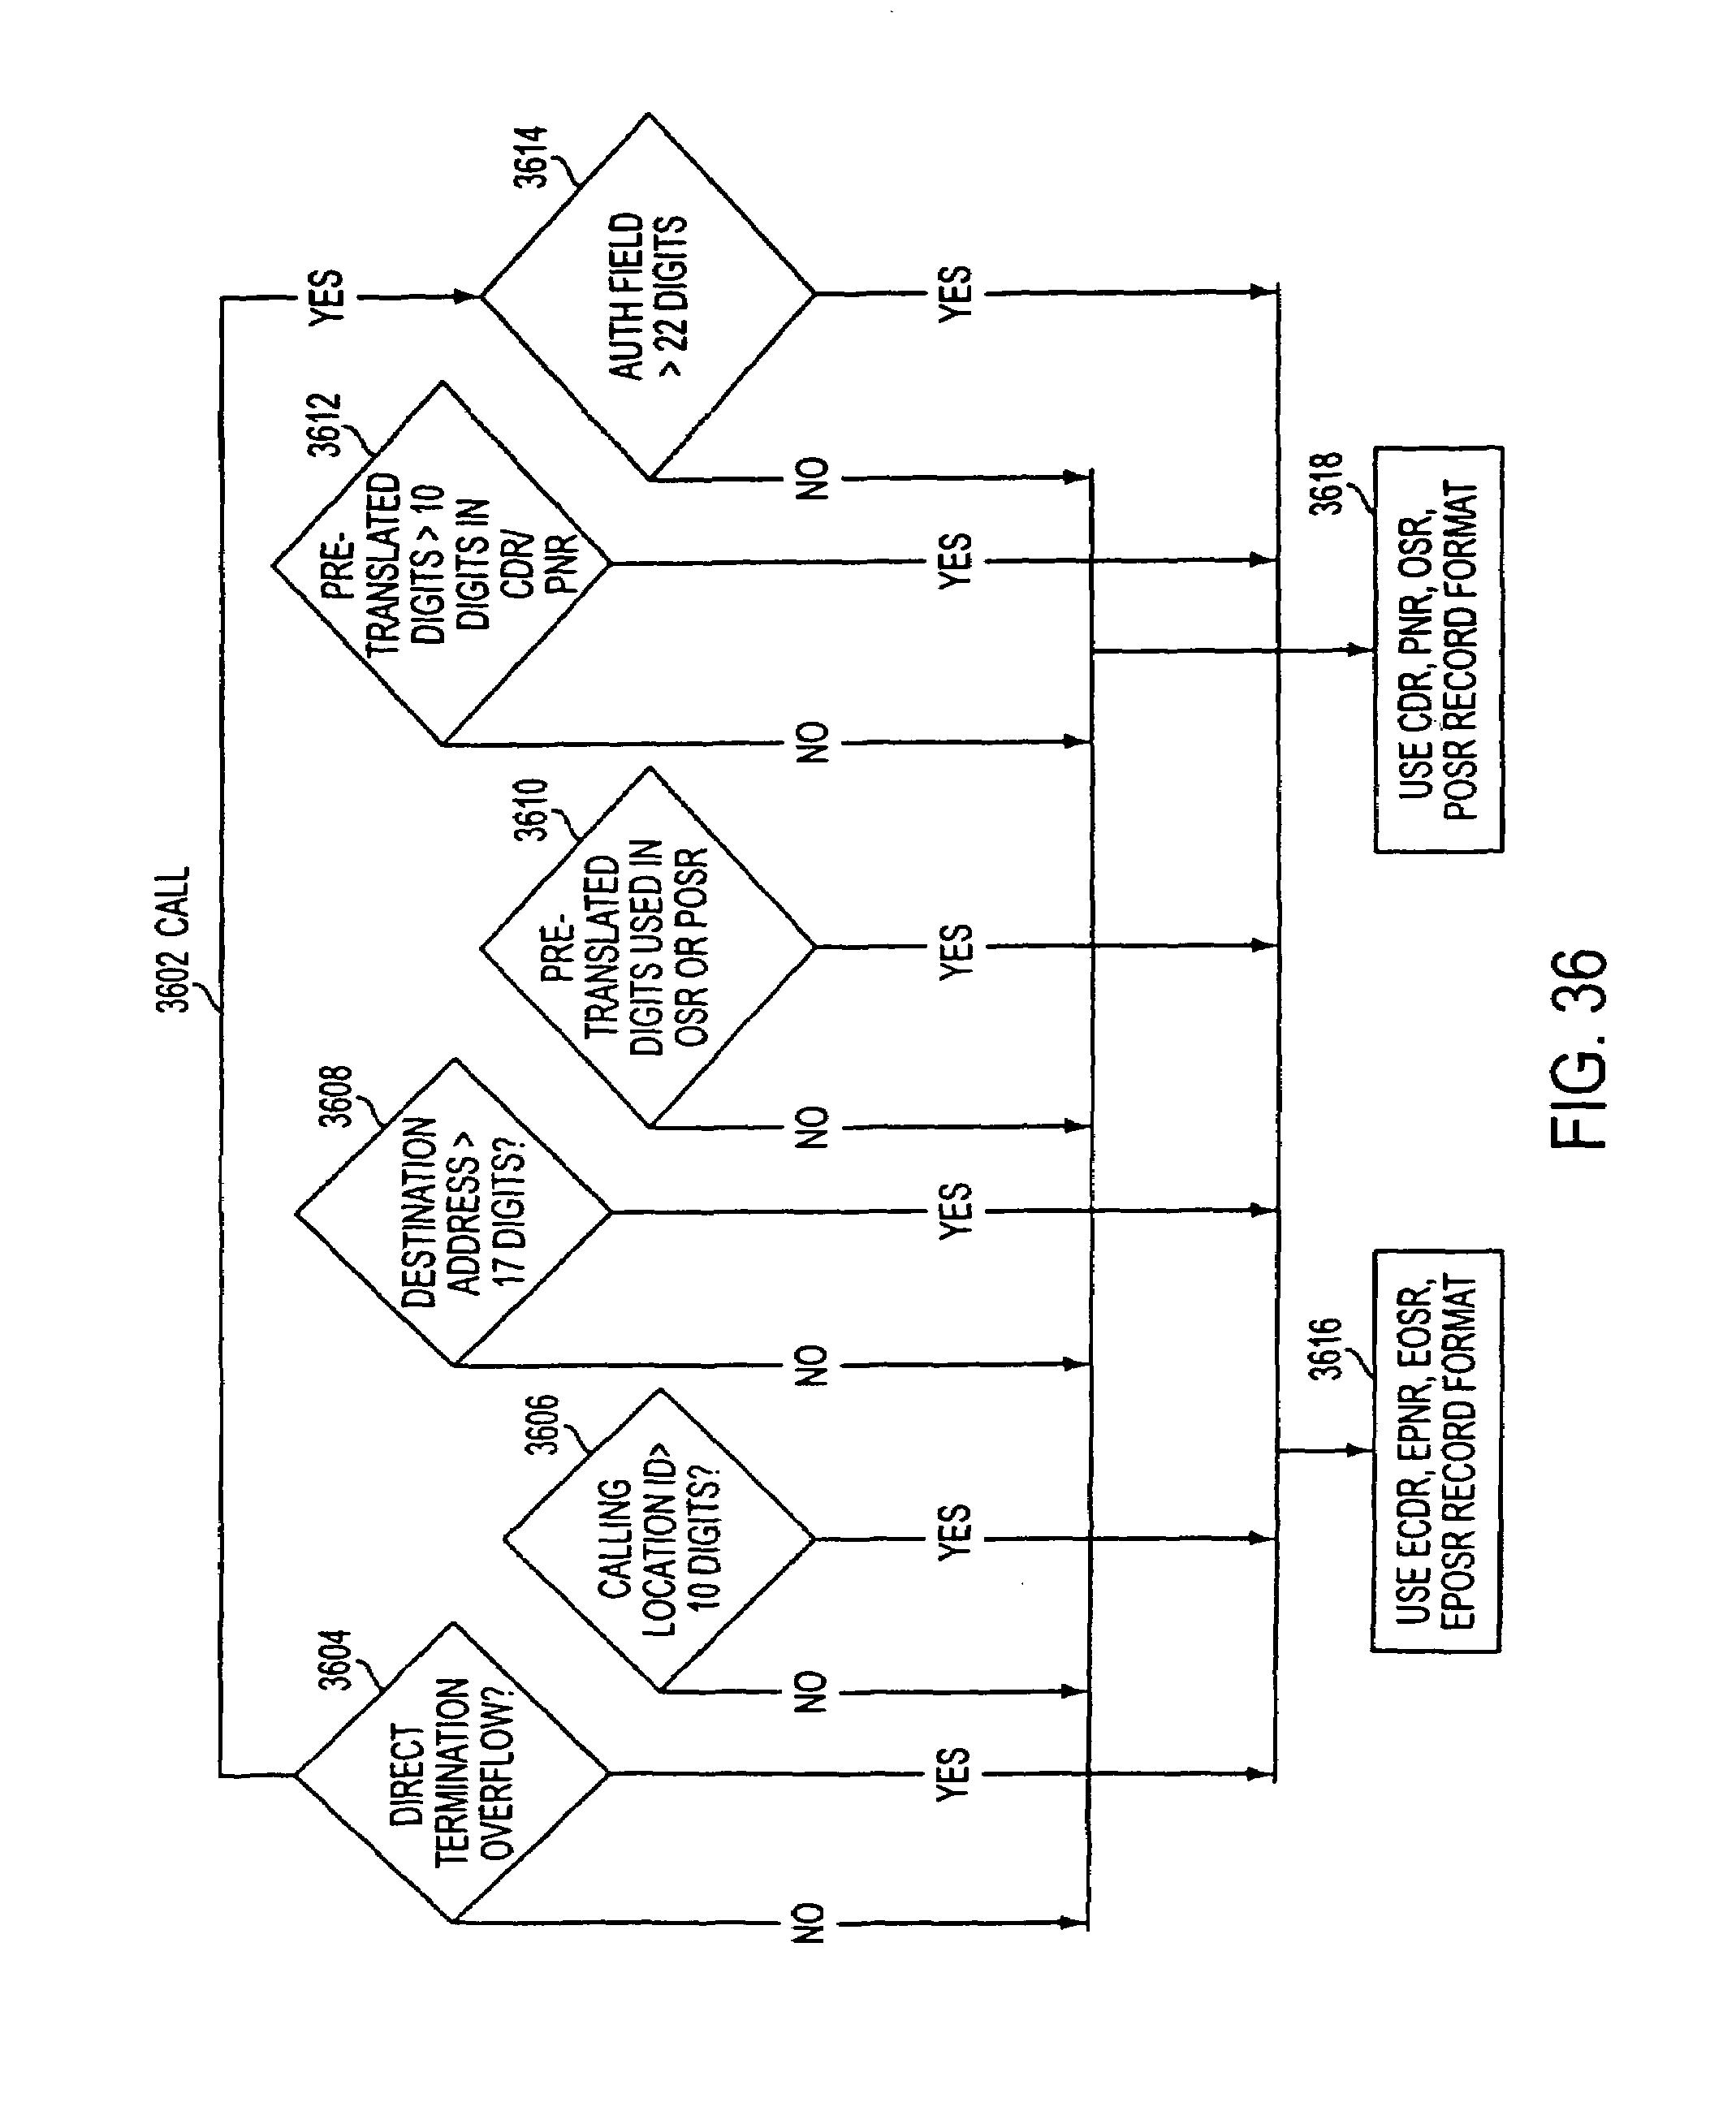 patent us 7 124 101 b1 Locksmith Resume Template patent images